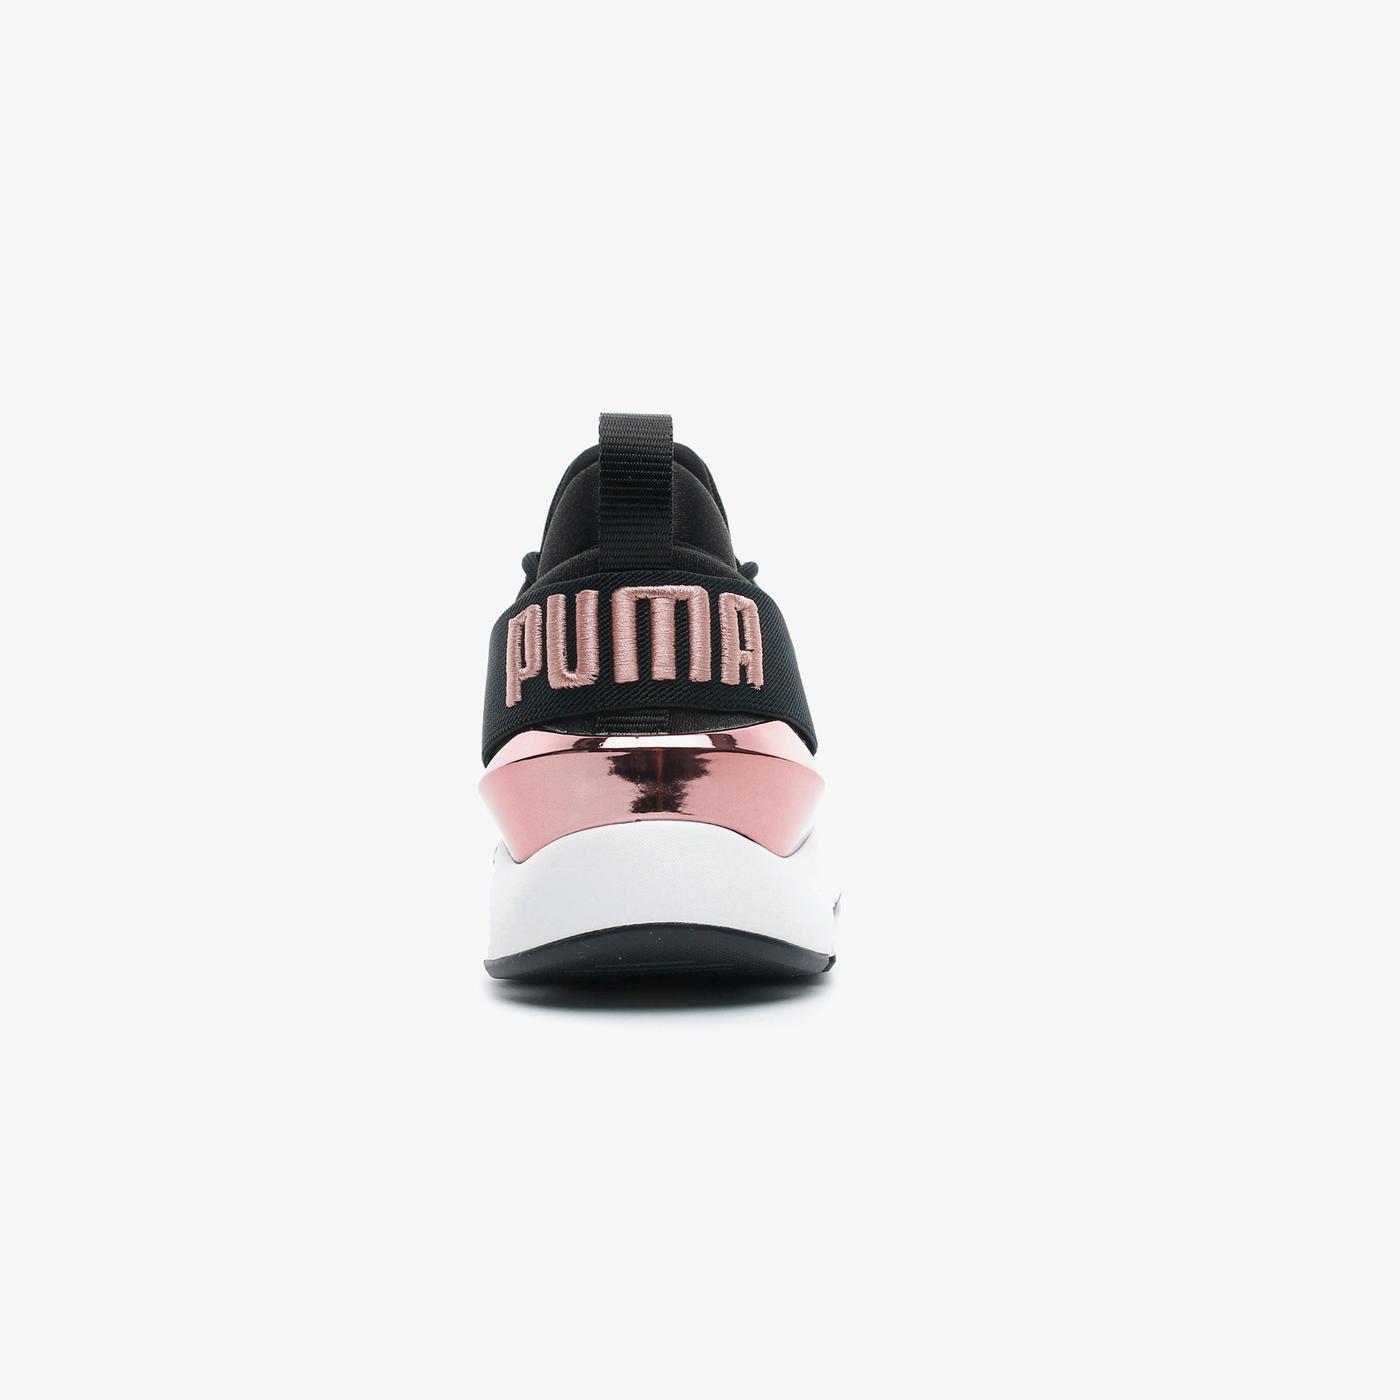 Puma Muse X3 Metallic Kadın Siyah Spor Ayakkabı